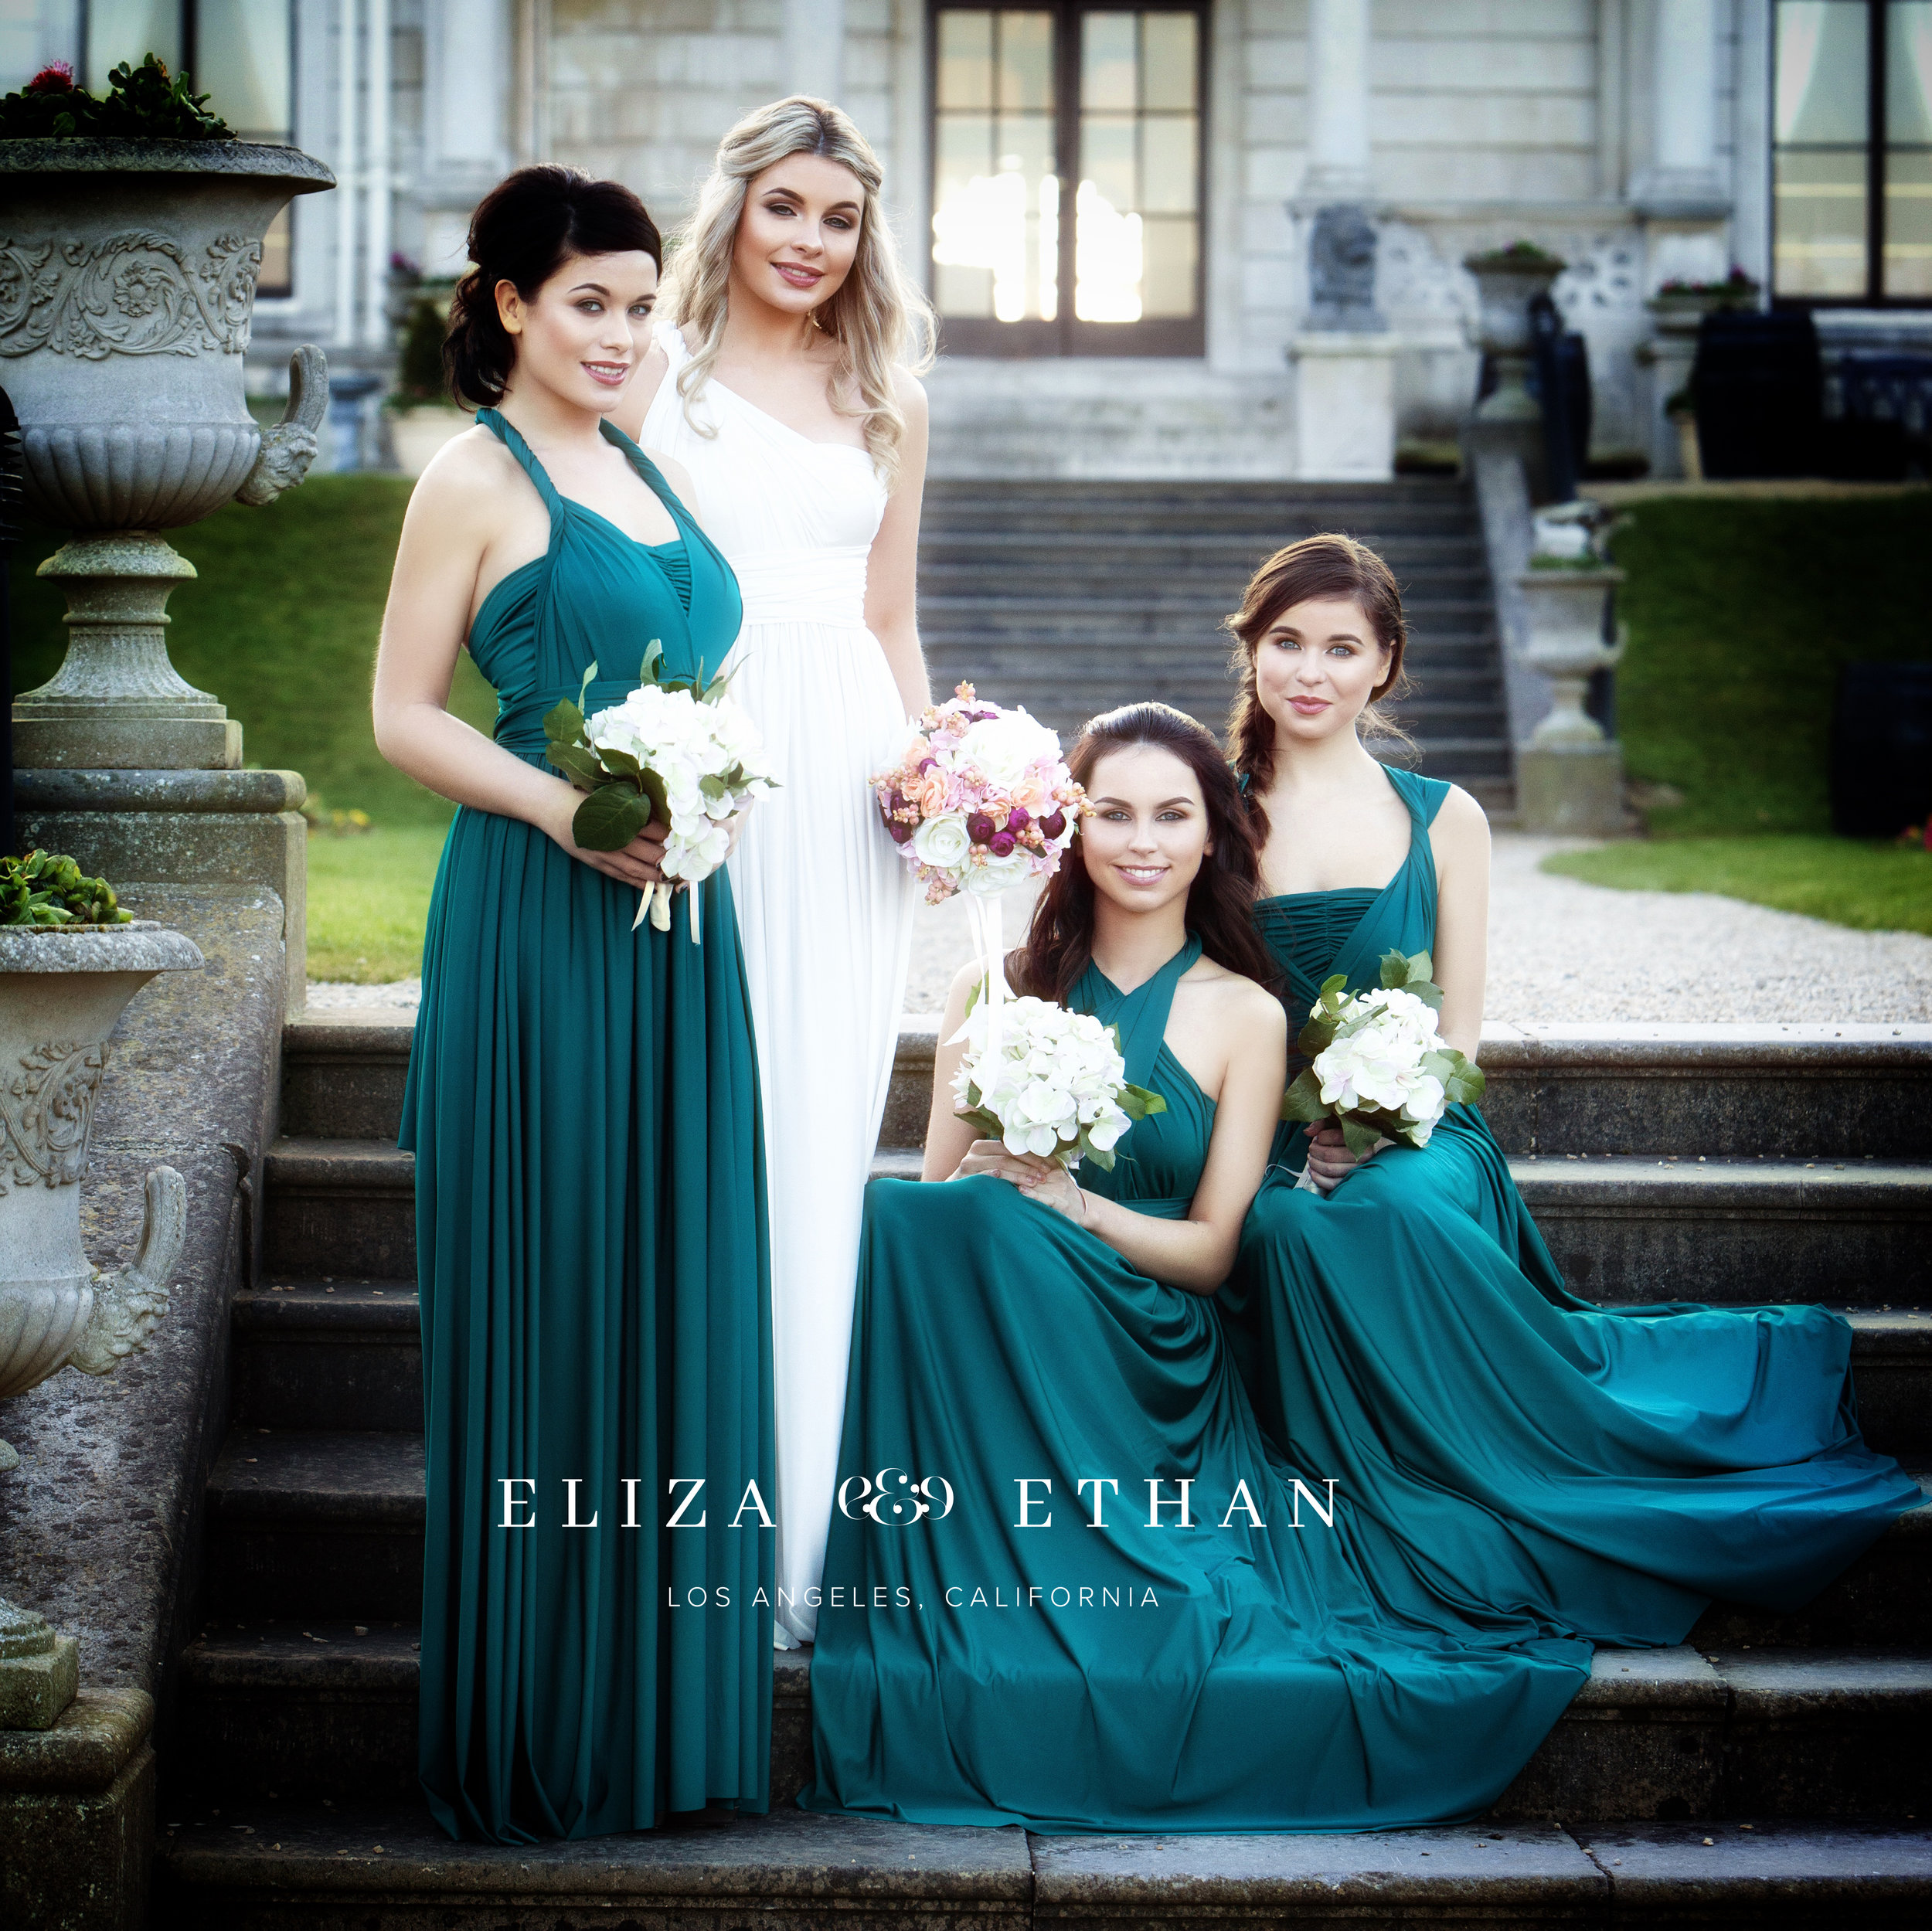 Eliza & Ethan multi way wrap dress teal bridesmaids dress wedding